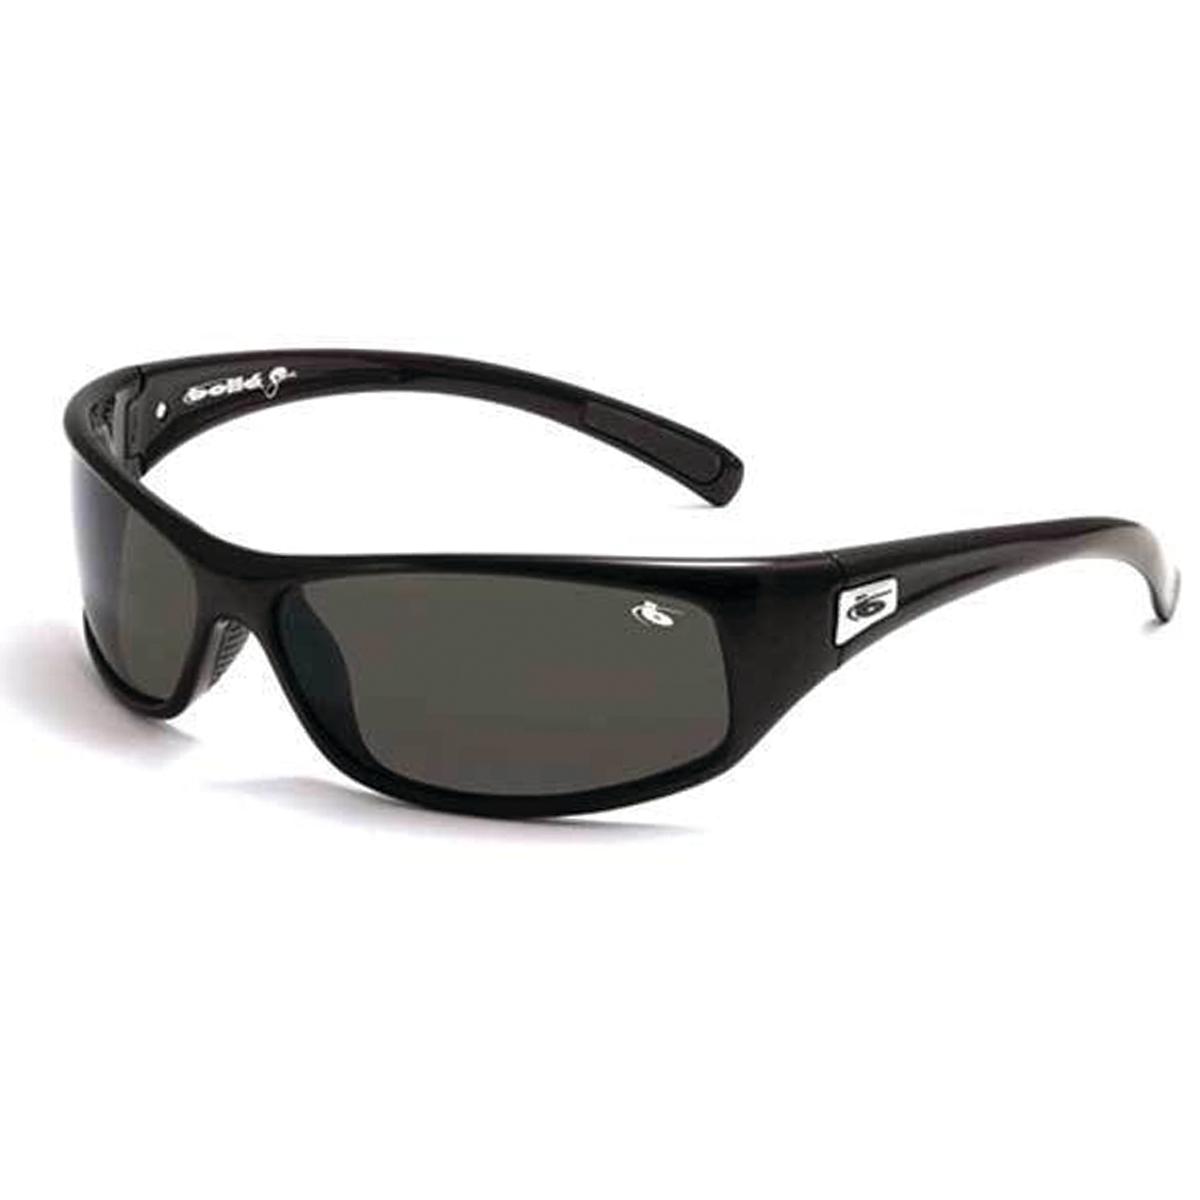 Edge Floating Sunglasses